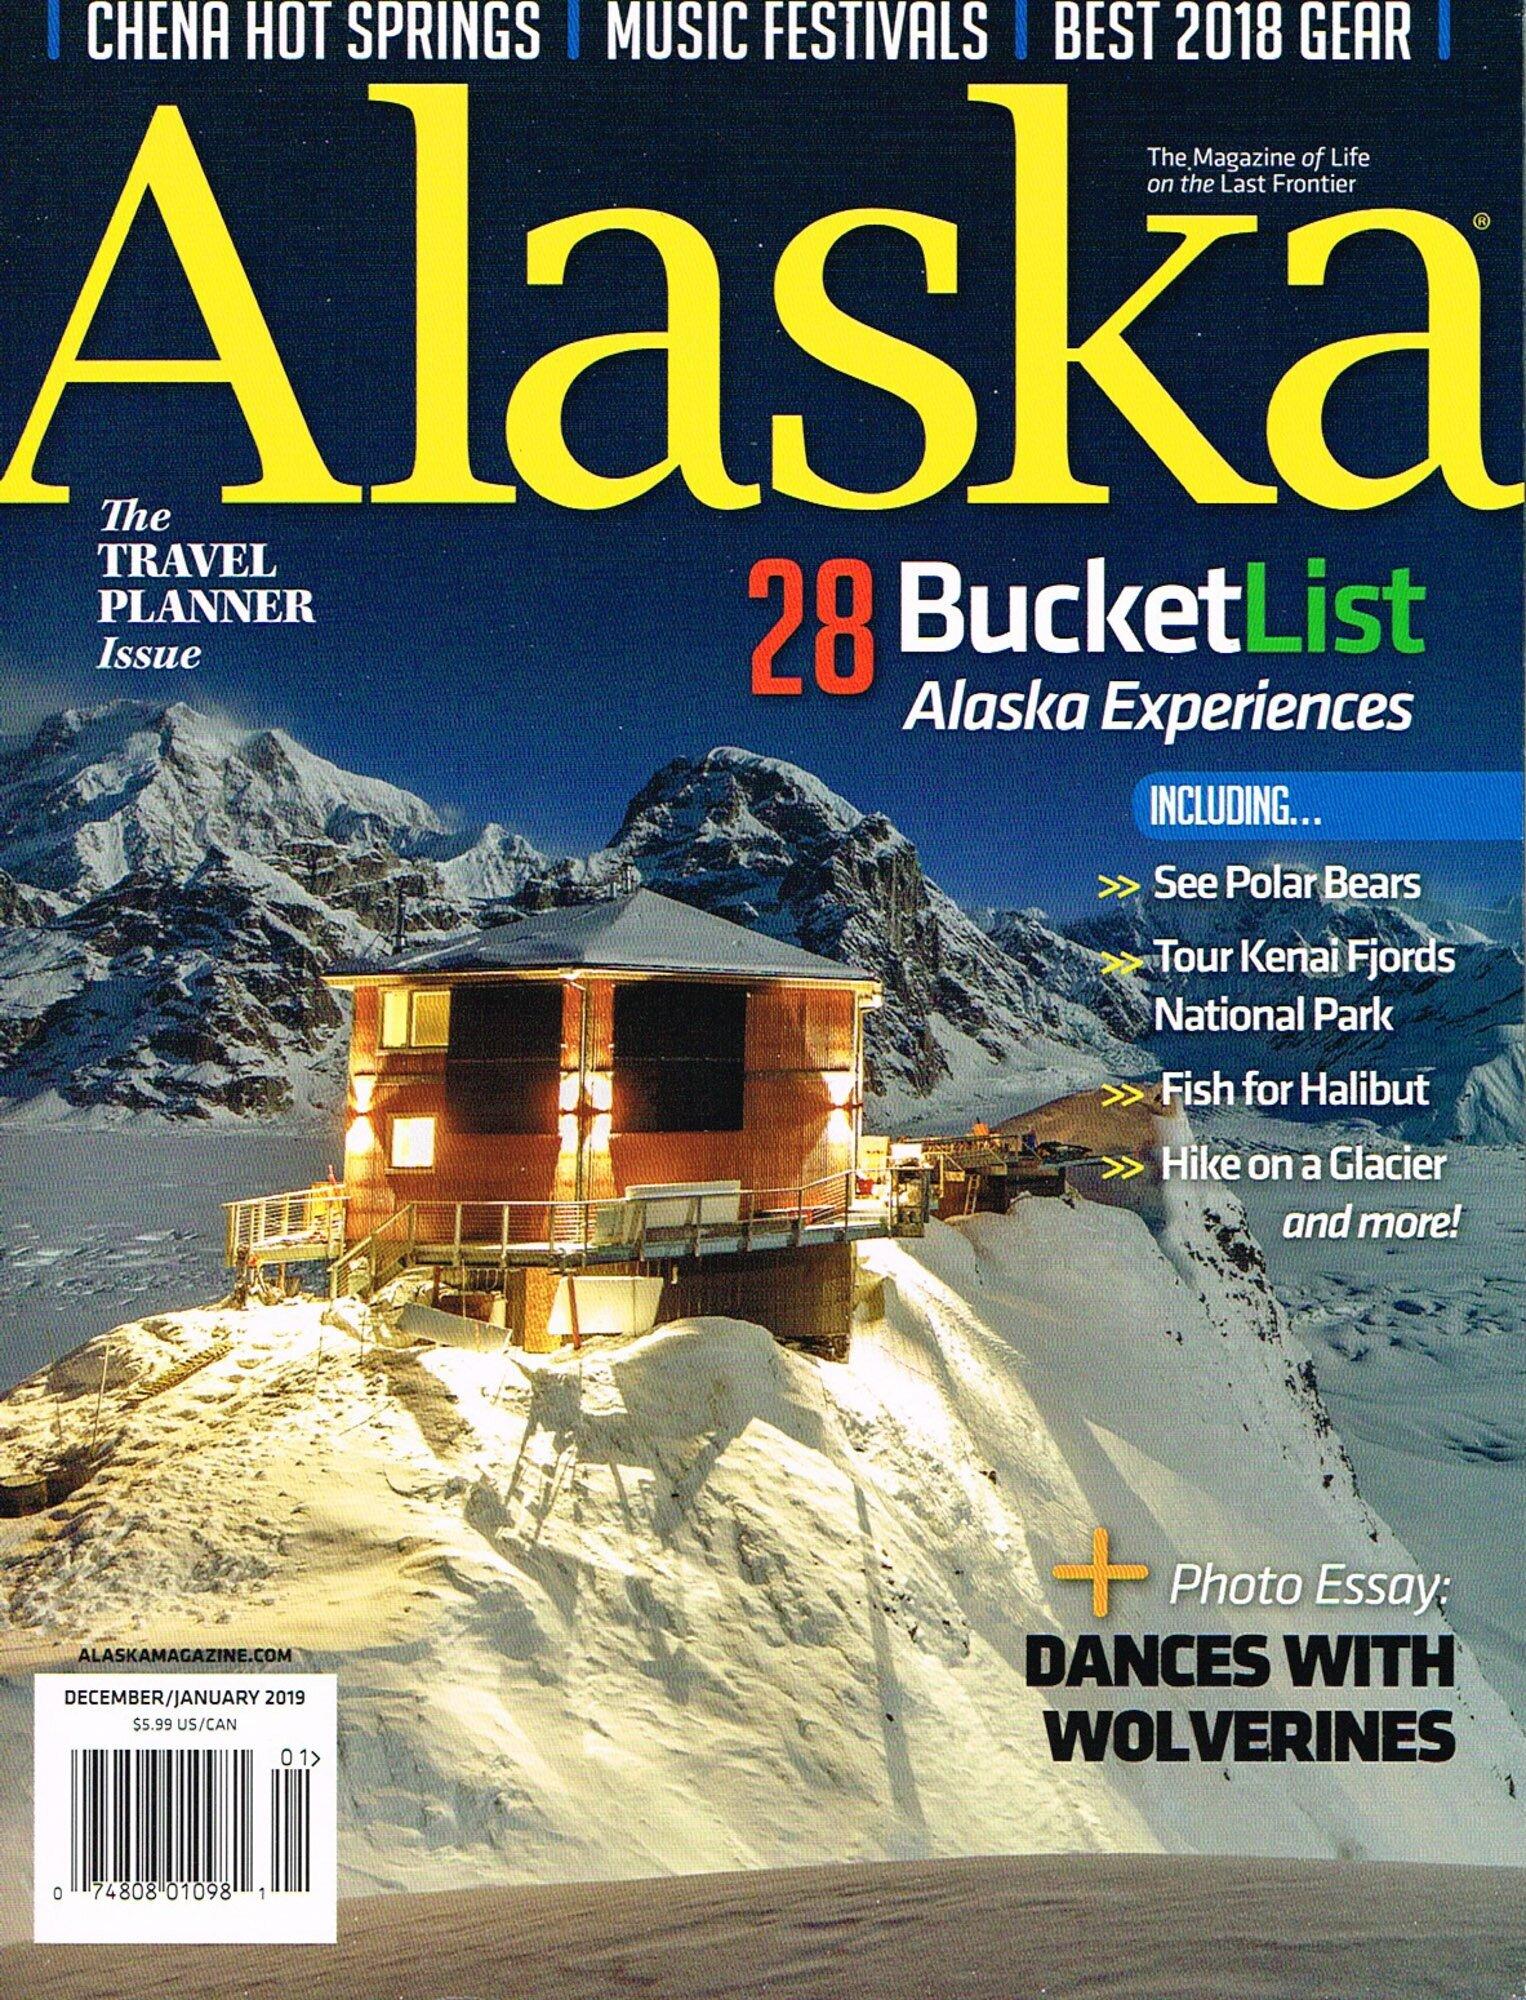 alaska-stock-photo-1-alaska-magazine-sheldon-chalet.jpg